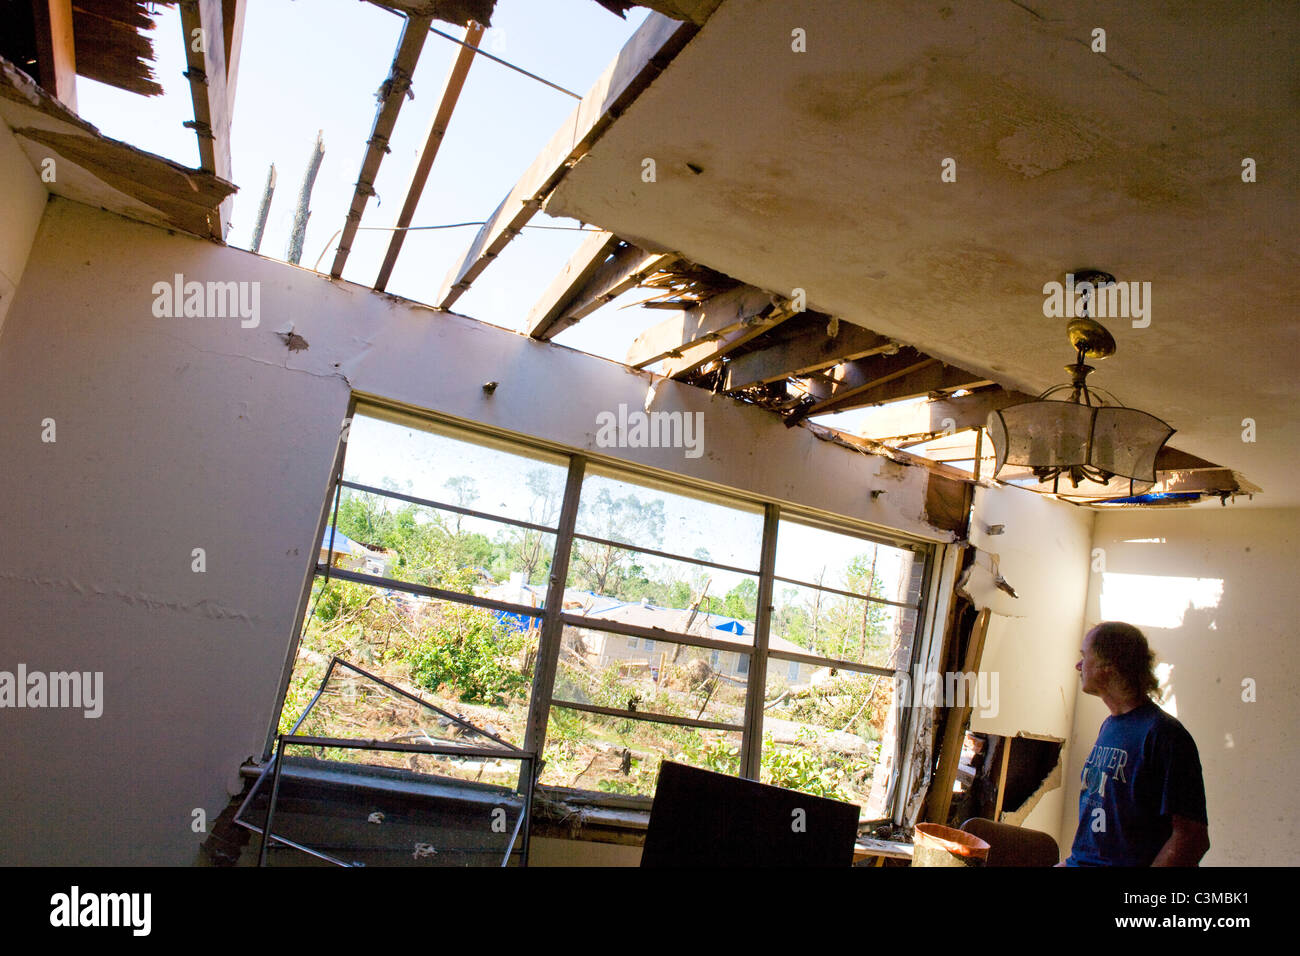 Man looks through window of his damaged home, after tornado struck his neighborhood near Tuscaloosa, Alabama, USA - Stock Image